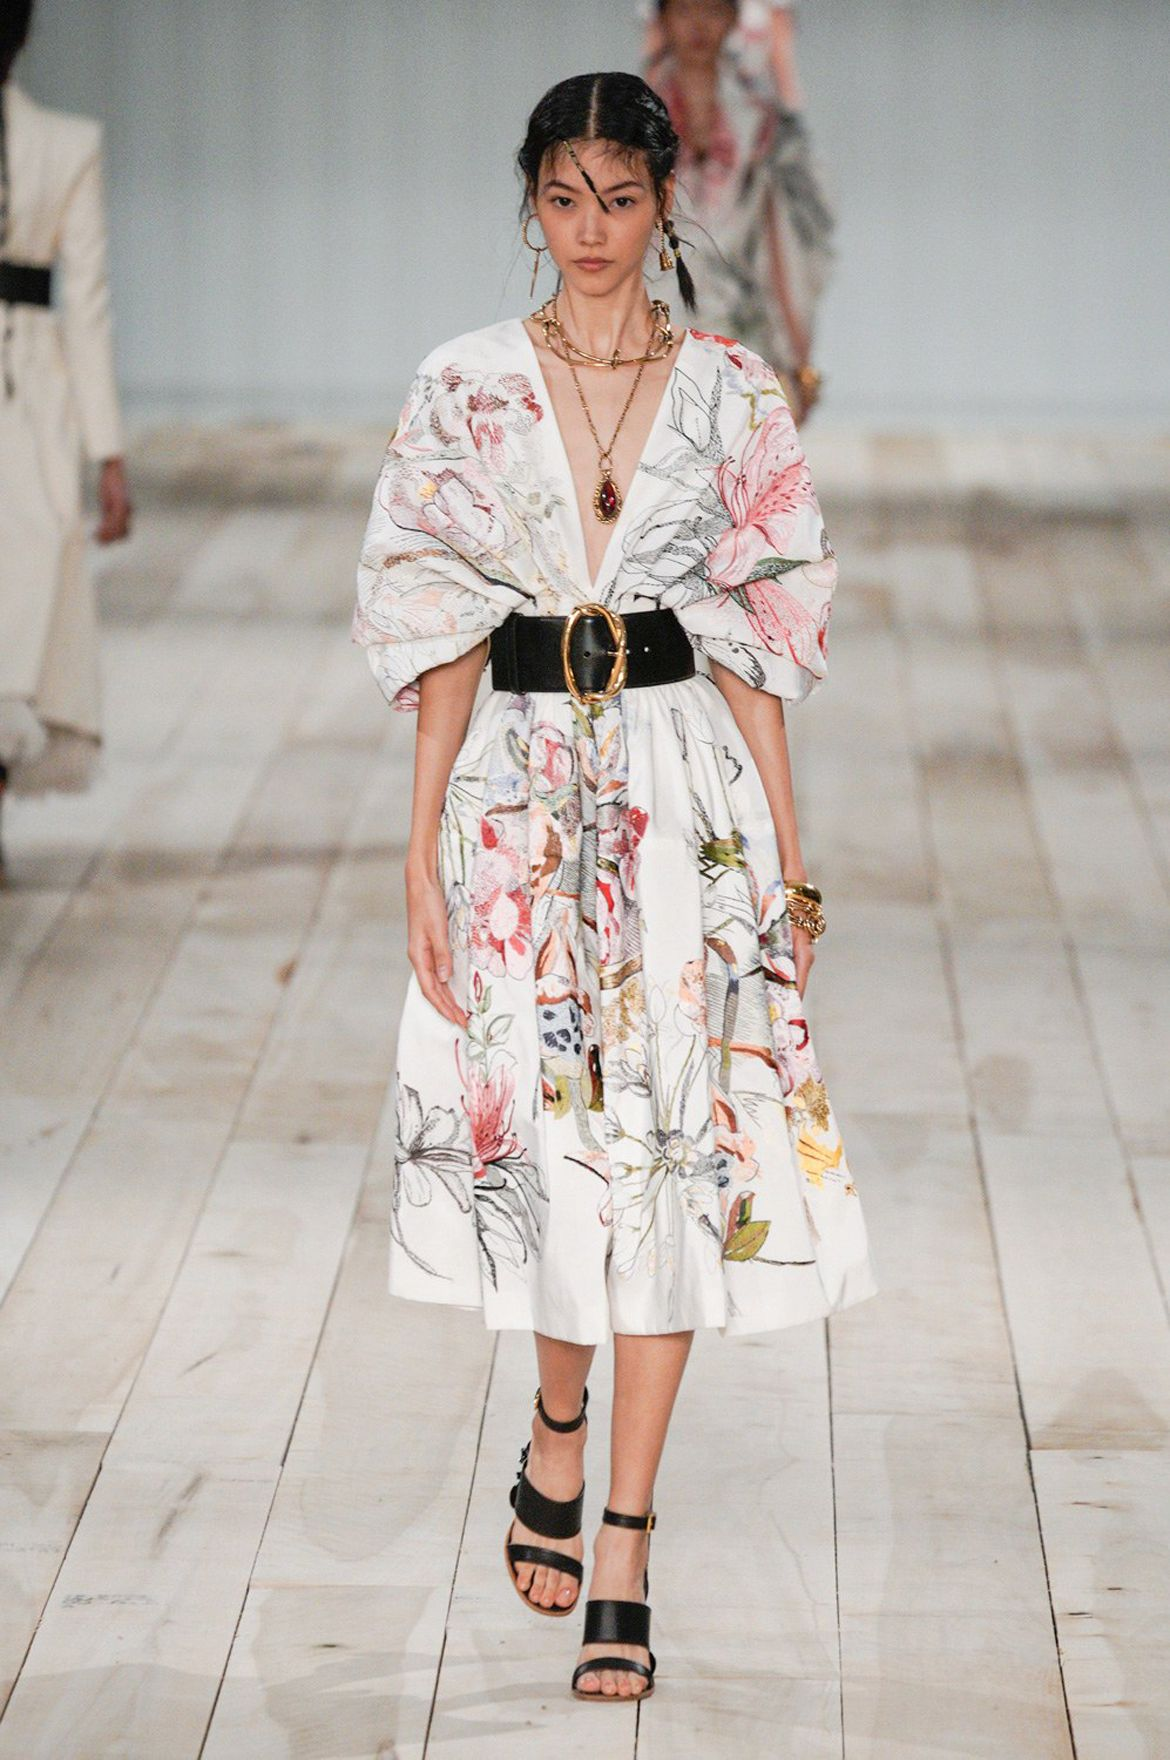 Alexander McQueen Spring Summer 2020 | Mcqueen fashion ...